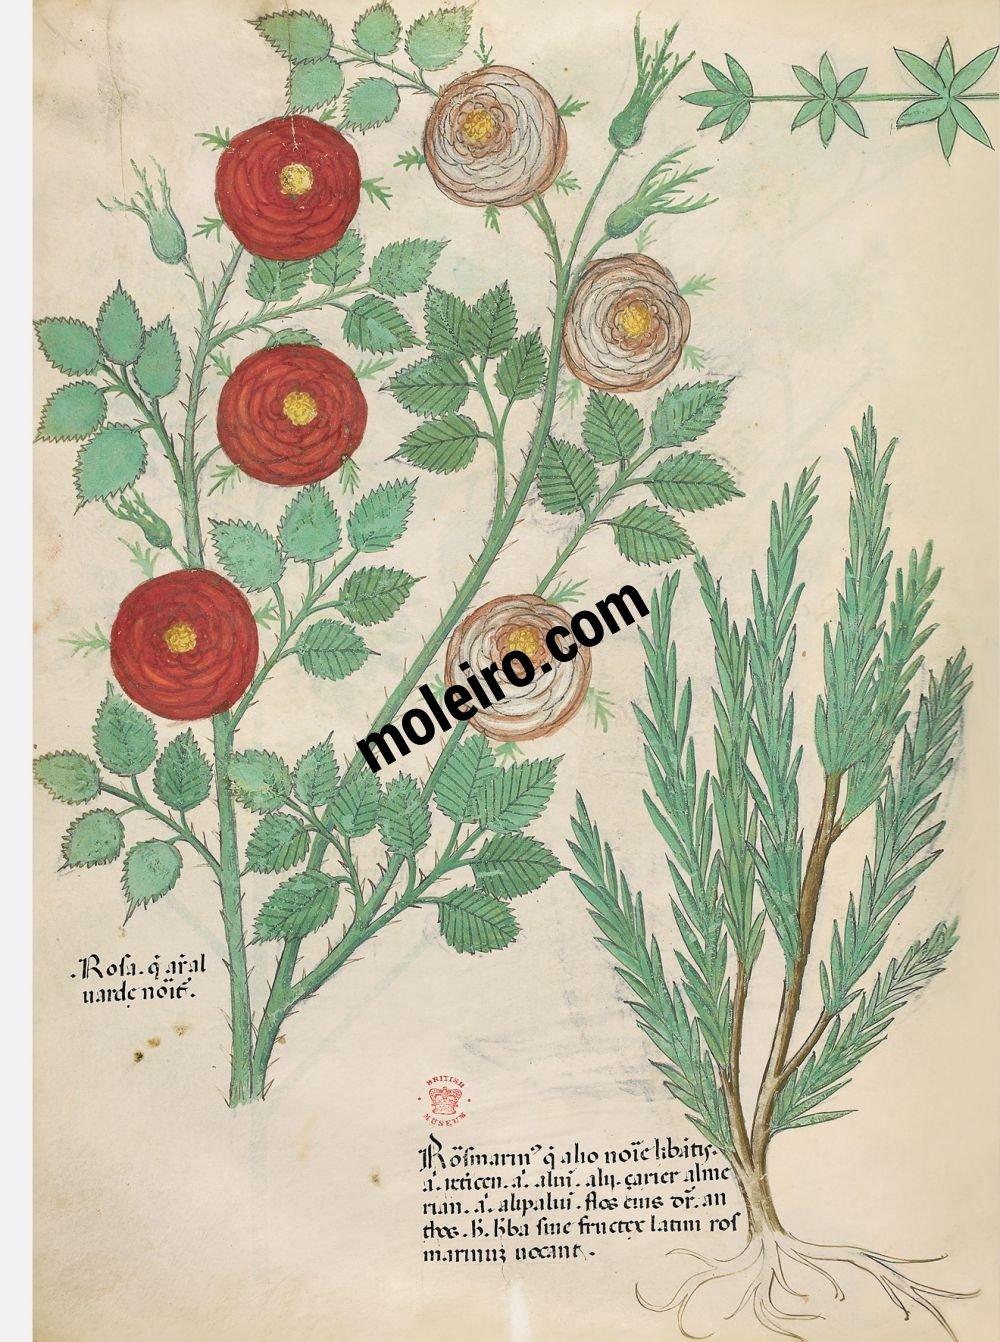 Tractatus de Herbis - Sloane 4016 f. 82v